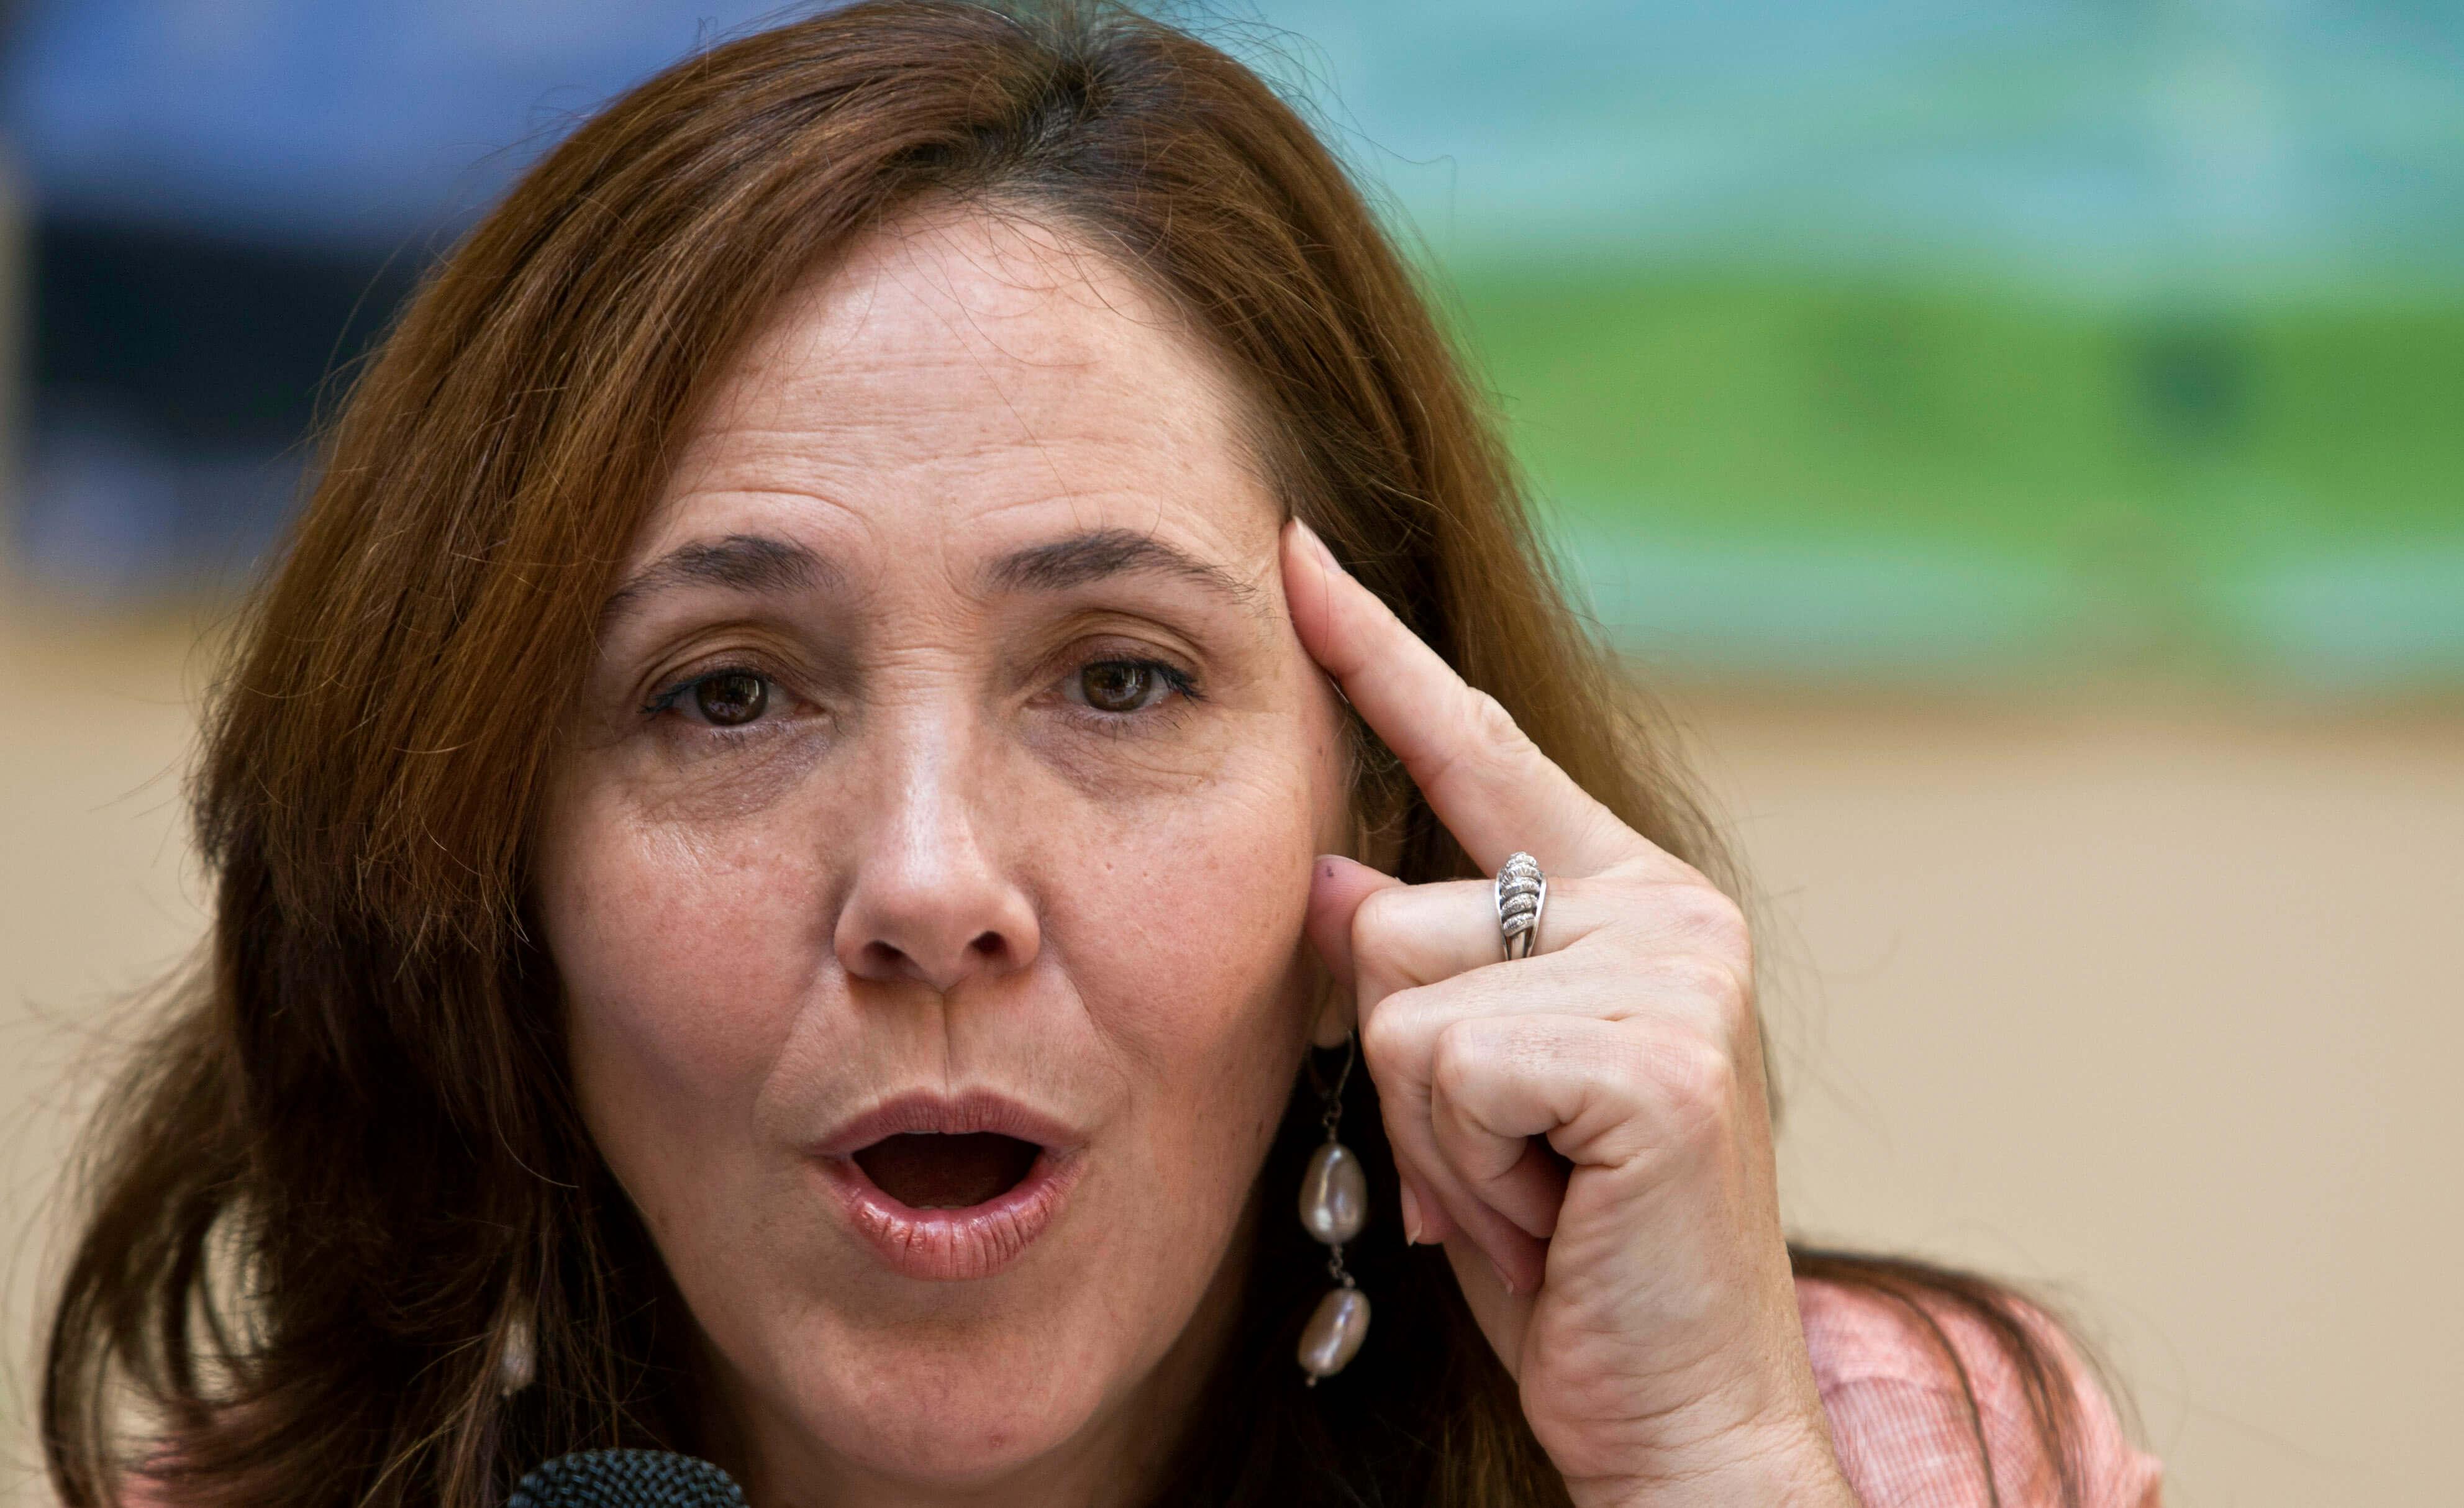 Mariela Castro, diputada cuba e hija del presidente Raúl Castro